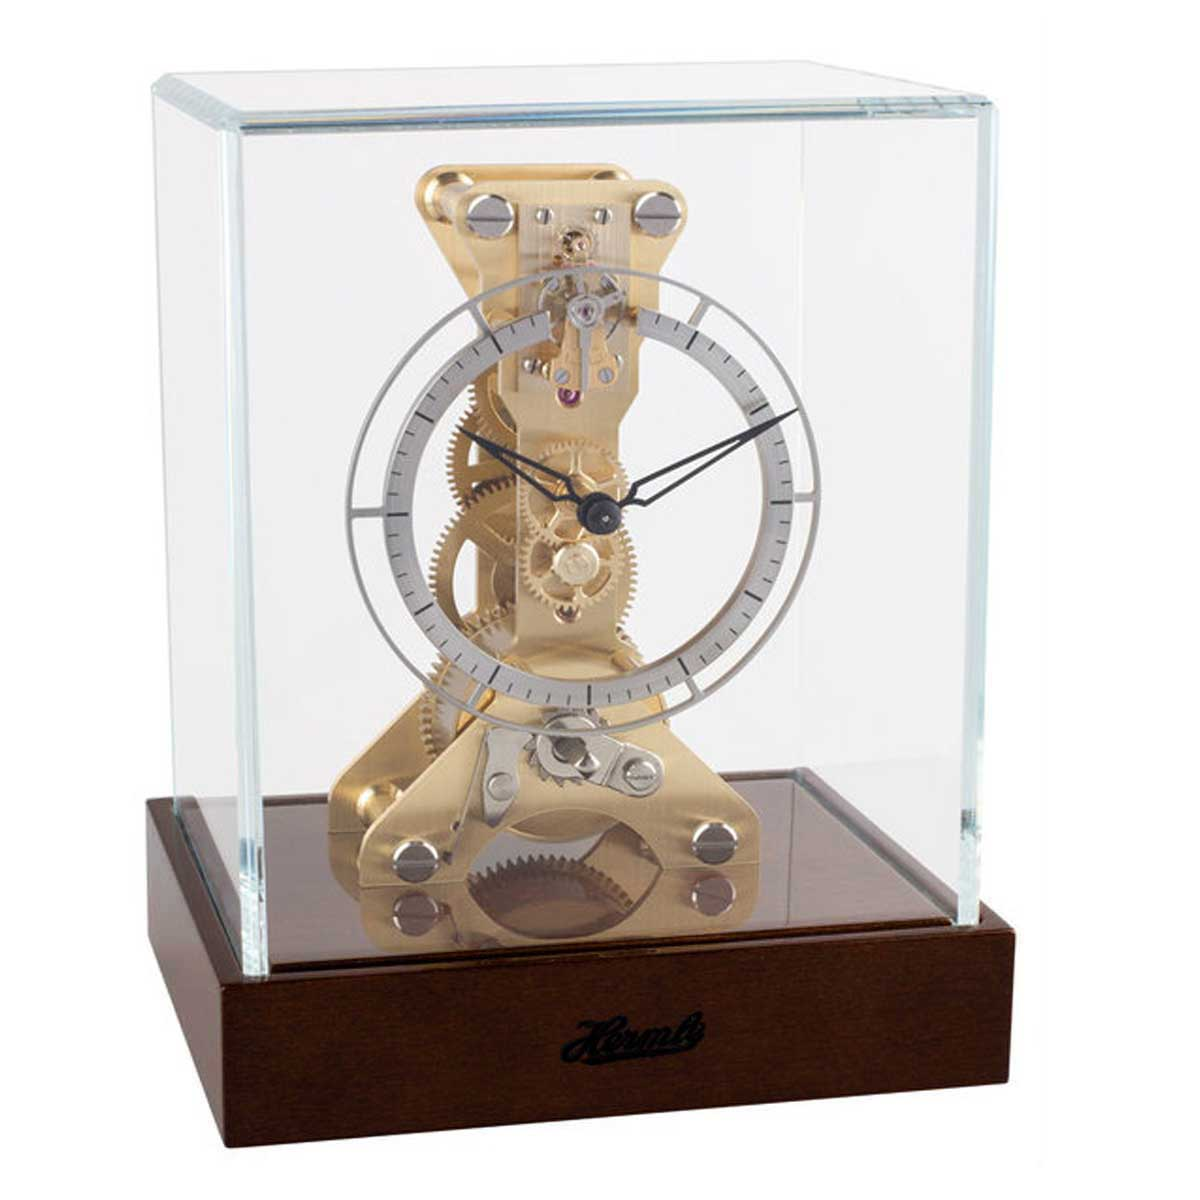 ALTON  23051-087762 Skeleton Mantel Clock Dark Walnut